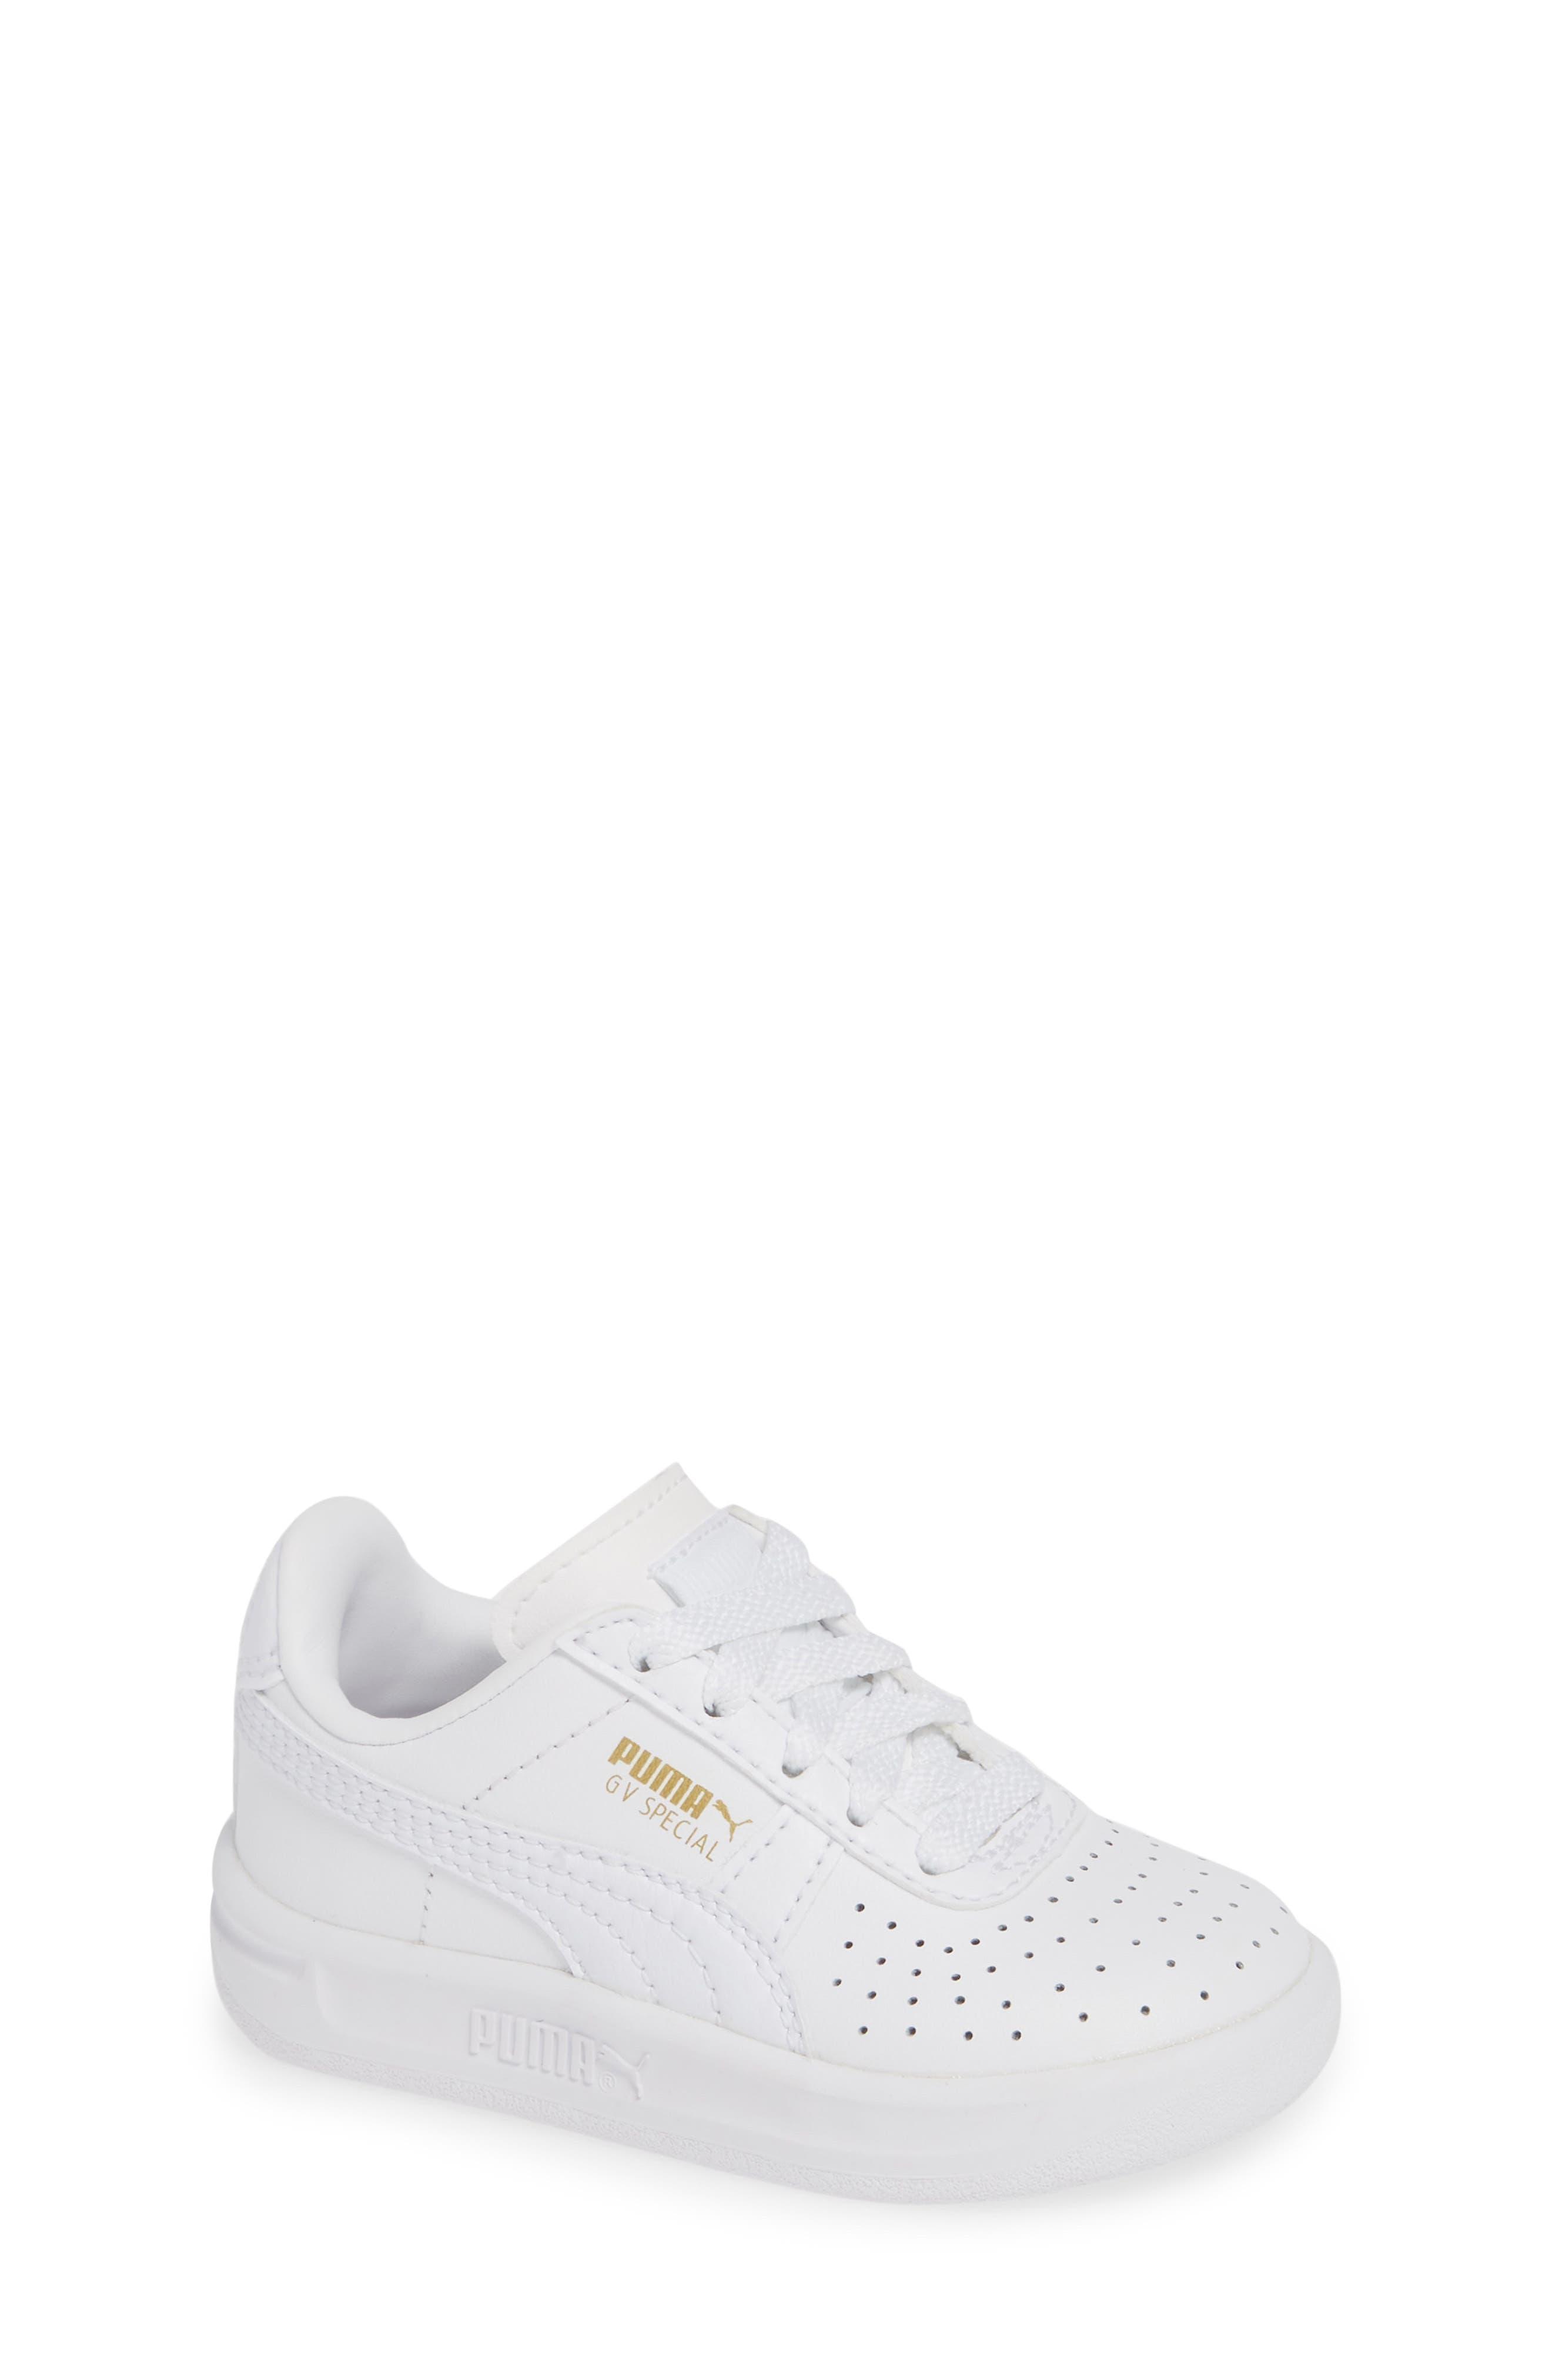 GV Special Sneaker,                             Main thumbnail 1, color,                             PUMA WHITE-PUMA TEAM GOLD